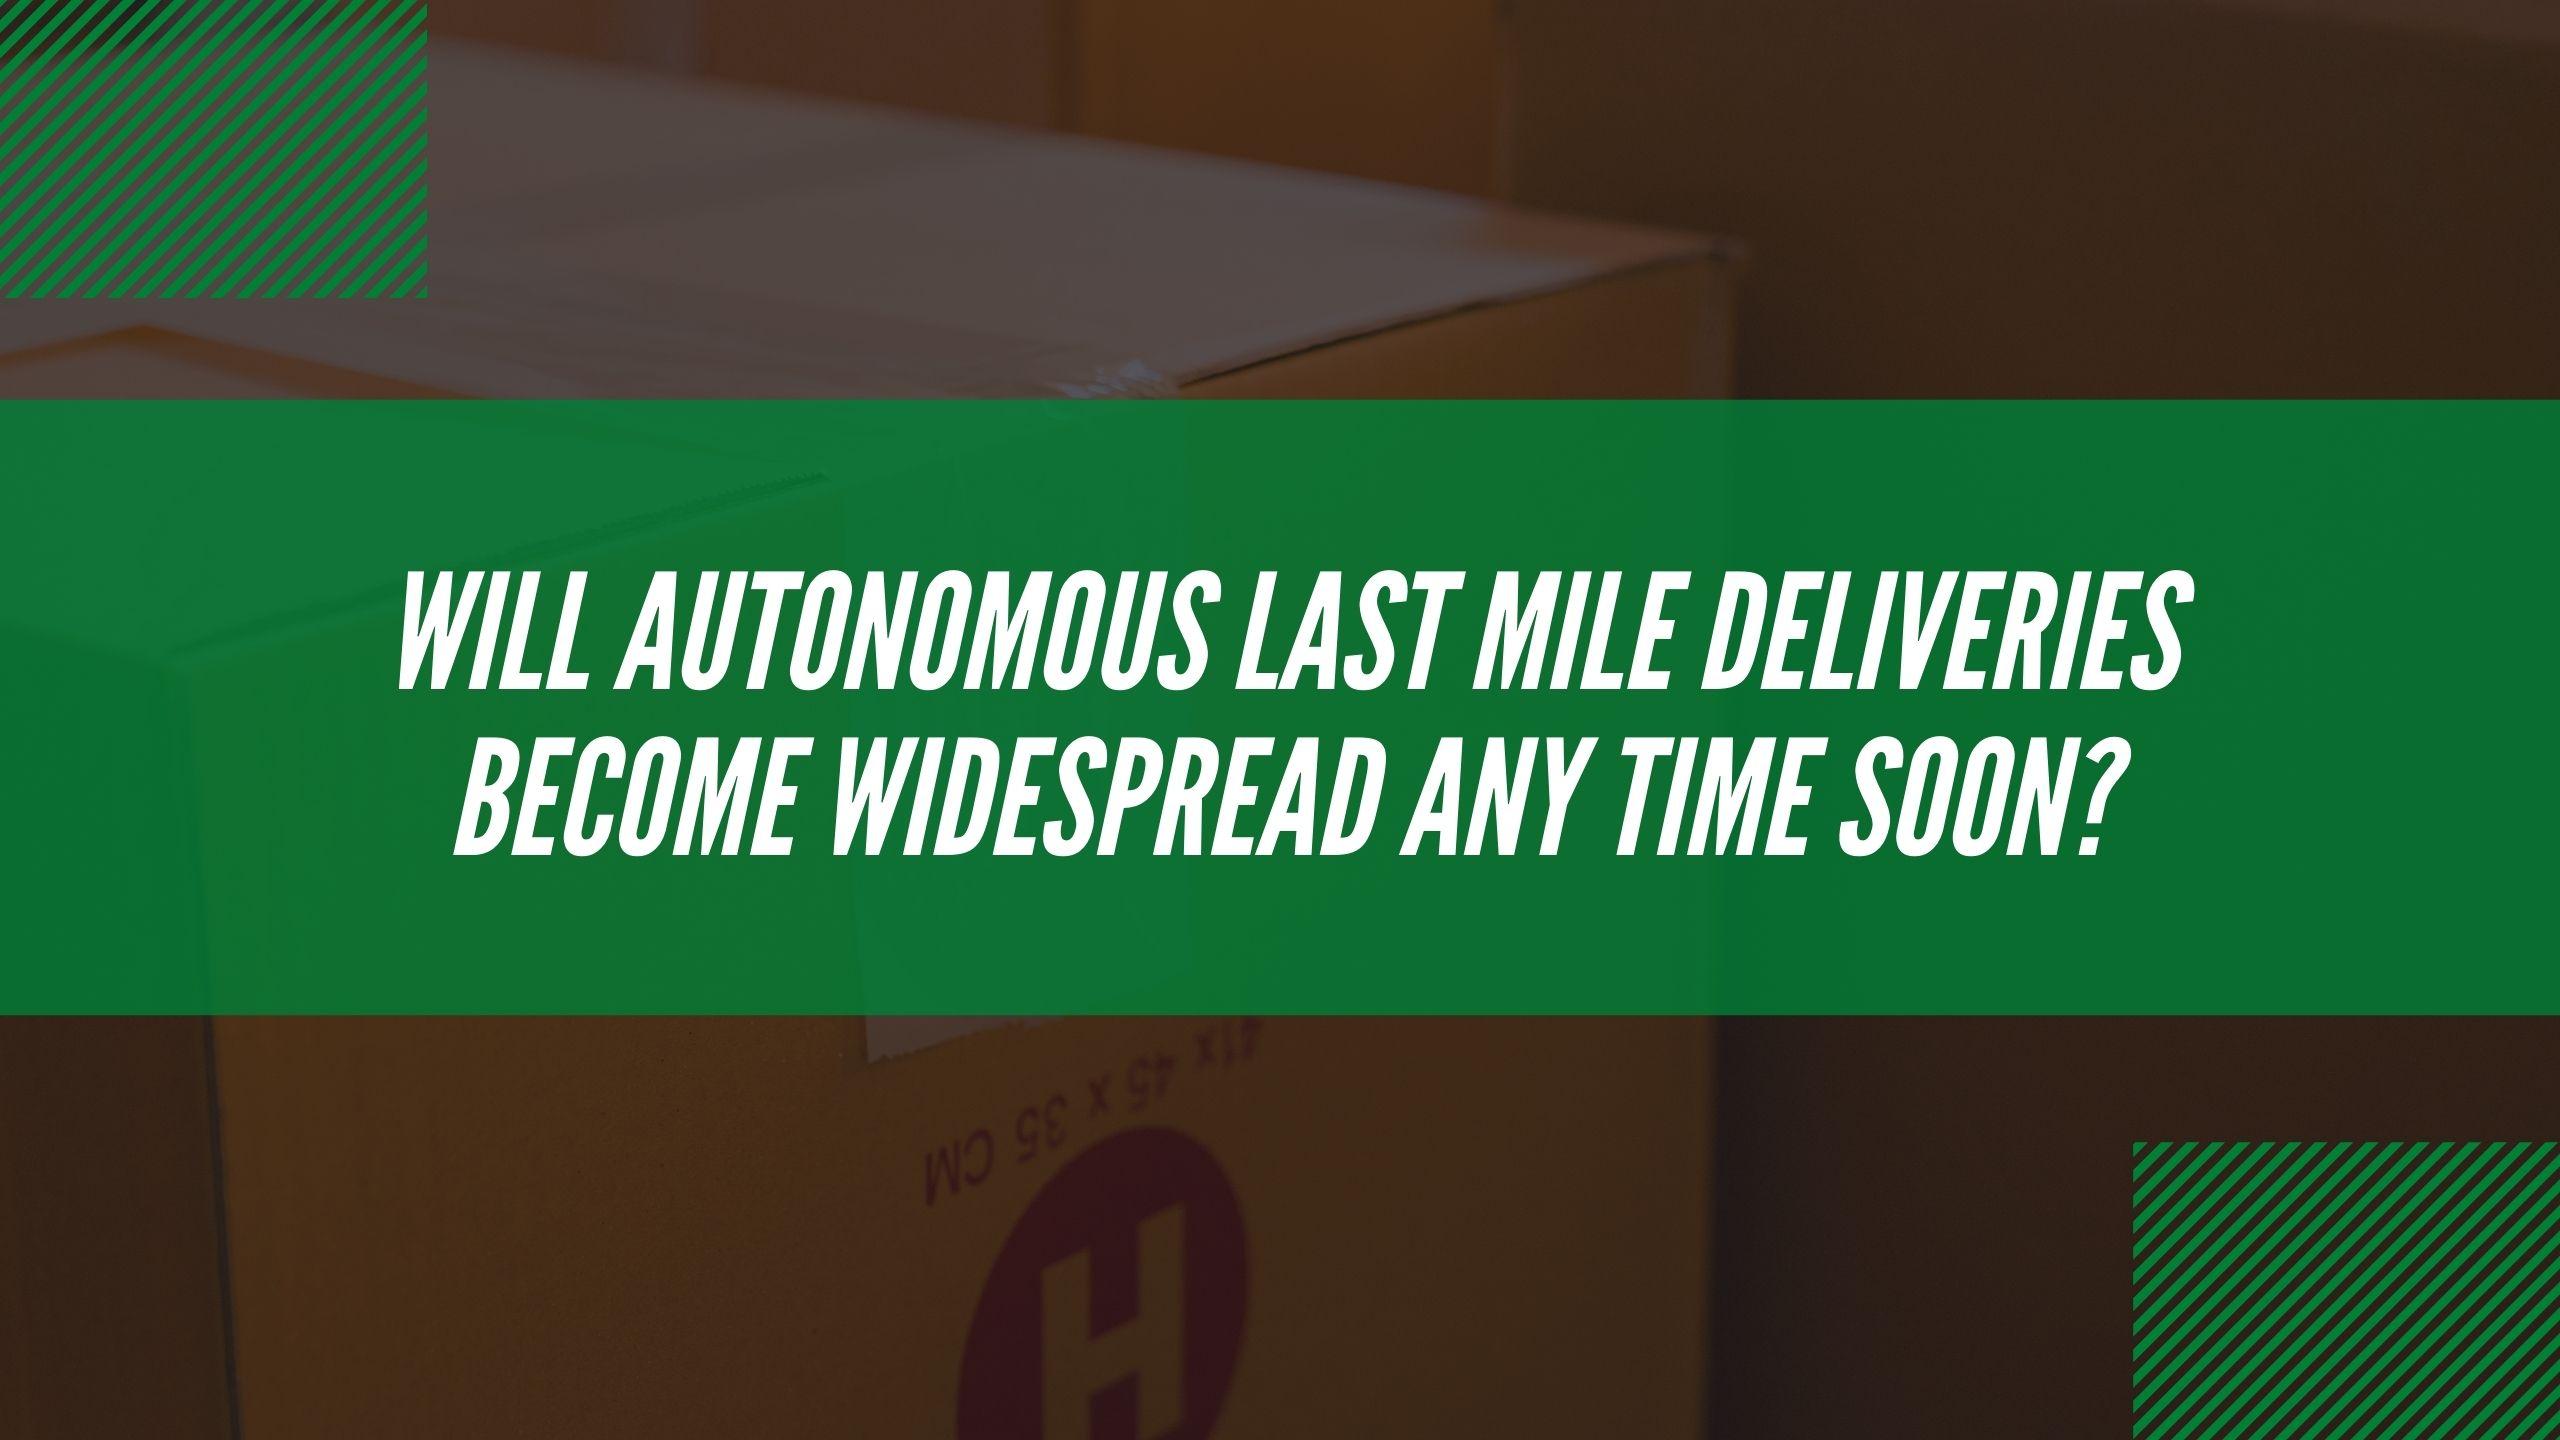 Will autonomous last mile deliveries become widespread soon?